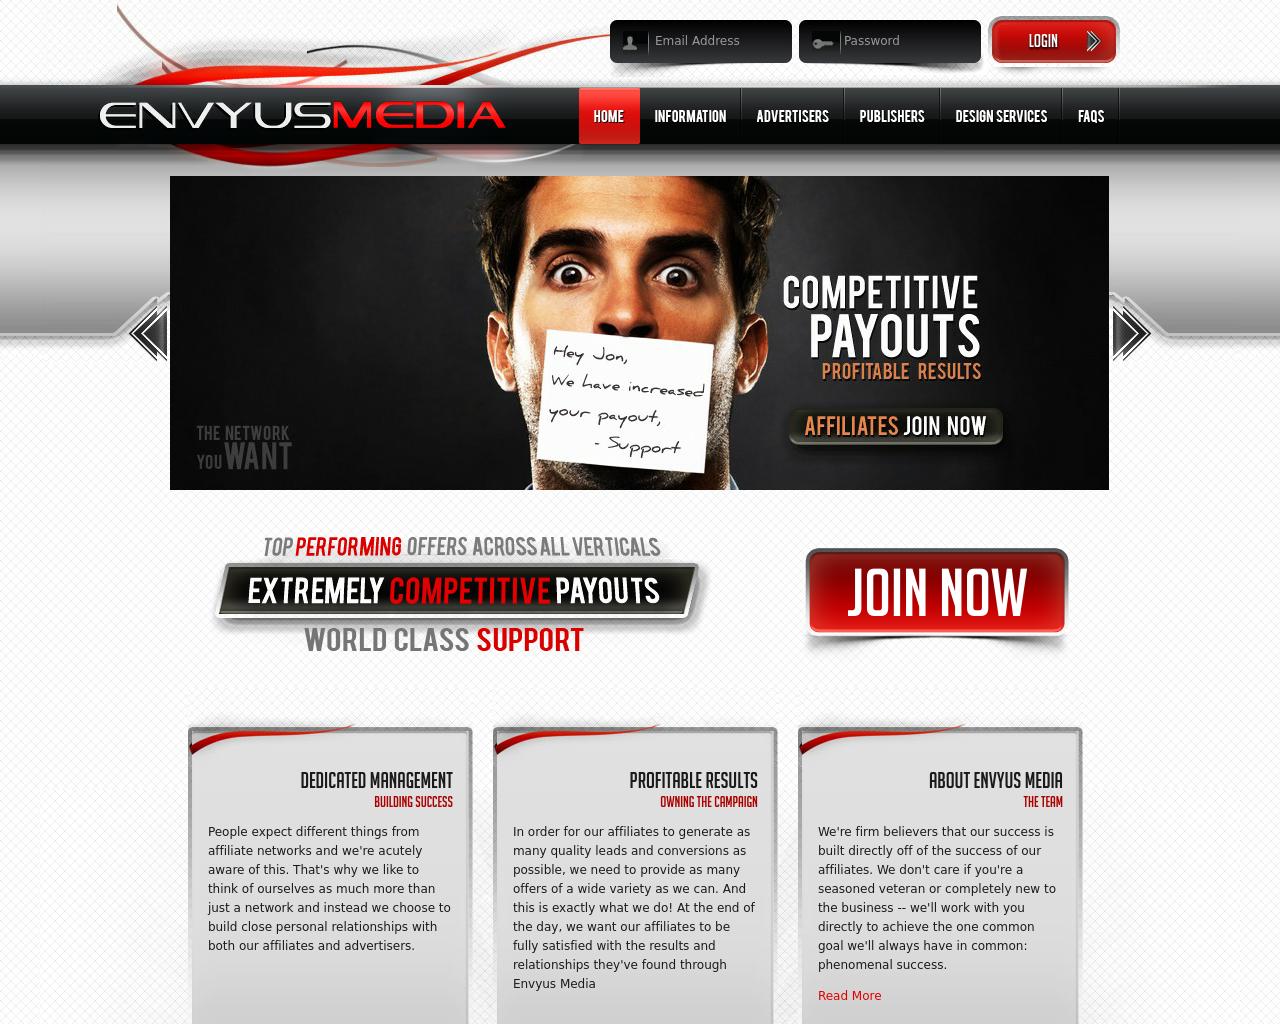 EnvyusMedia-Advertising-Reviews-Pricing